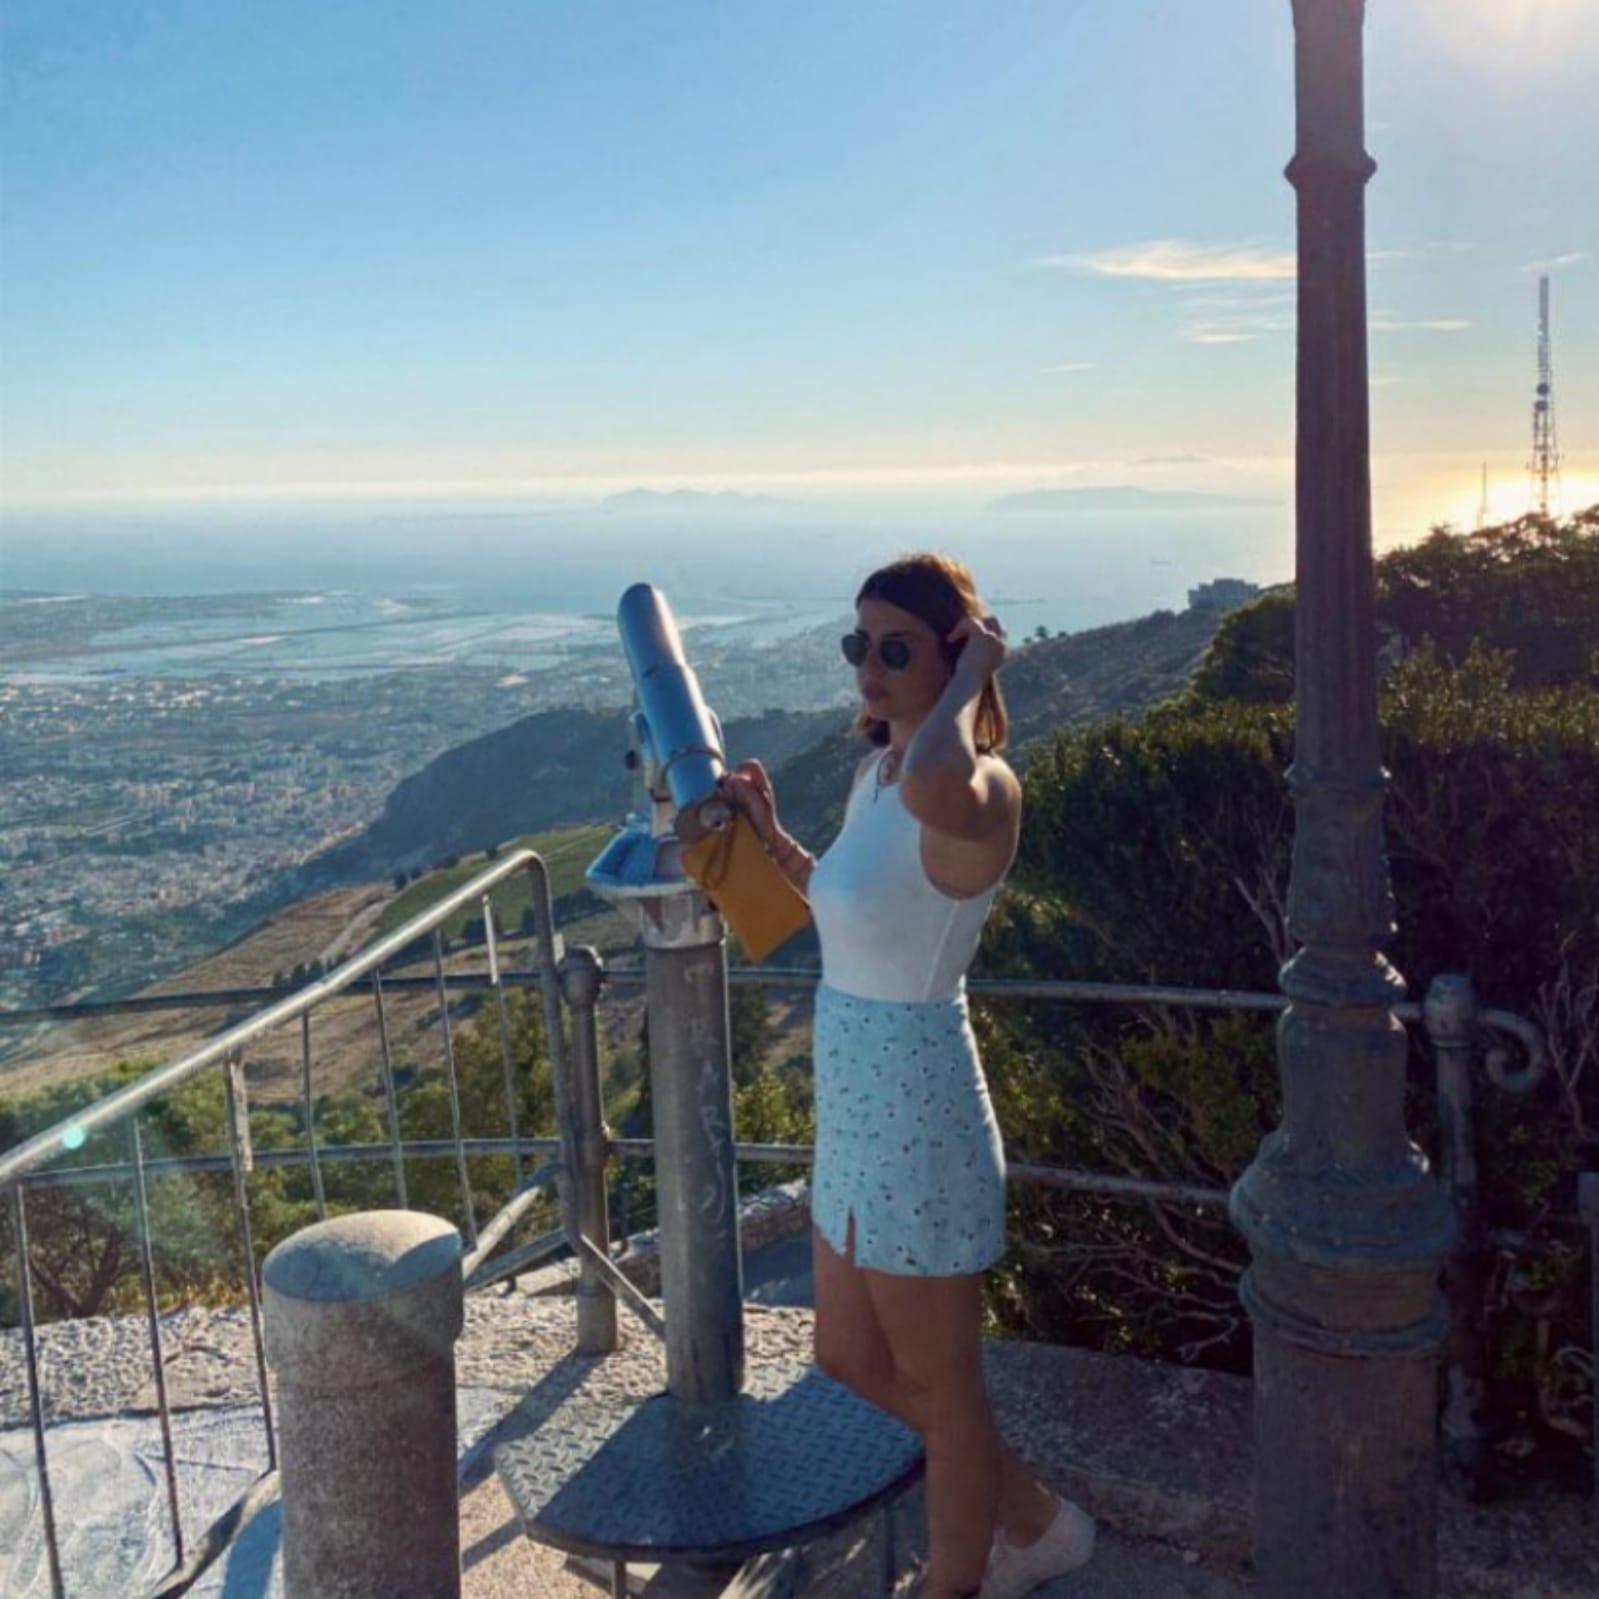 https://cityxcape.it/wp-content/uploads/2021/02/Andrea-Romano-Travel-Blogger-cityxcape-1.jpeg